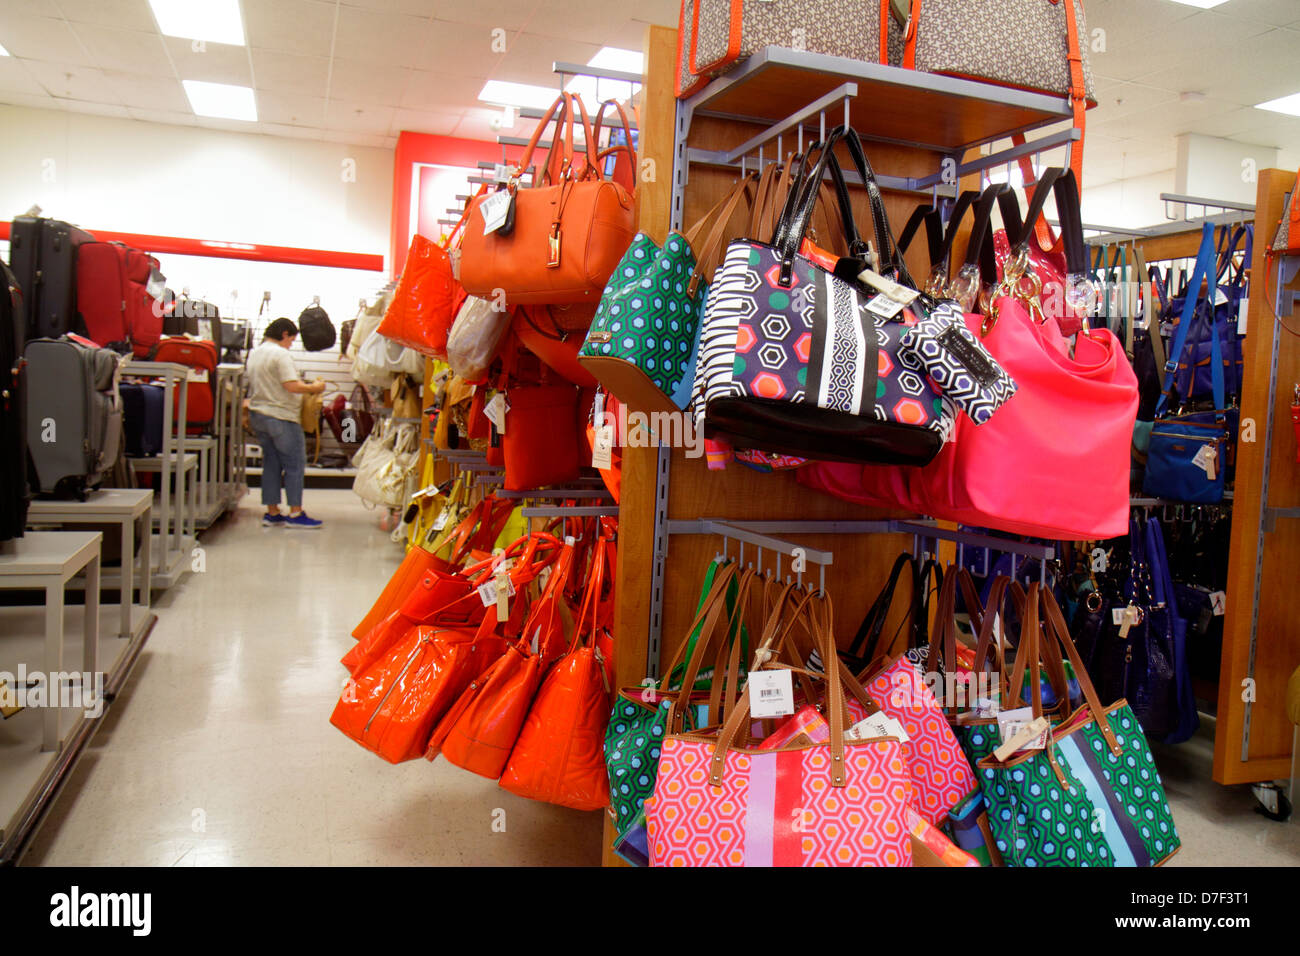 Miami Florida Tj Maxx Discount Department Store Woman S